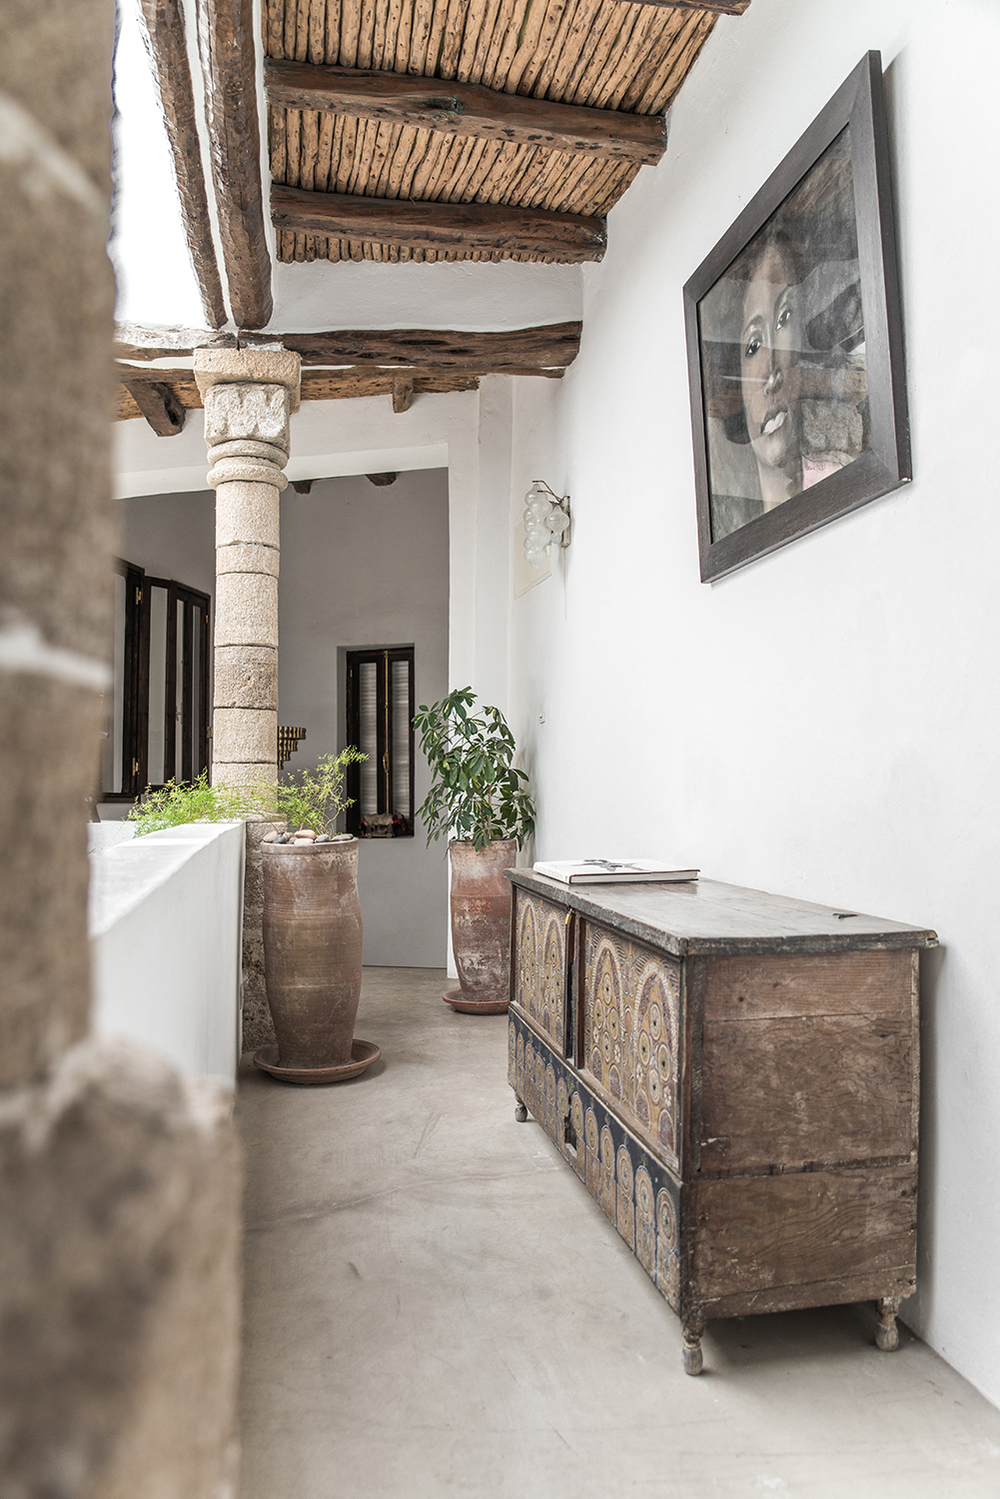 5 Columns Essaouira Morocco